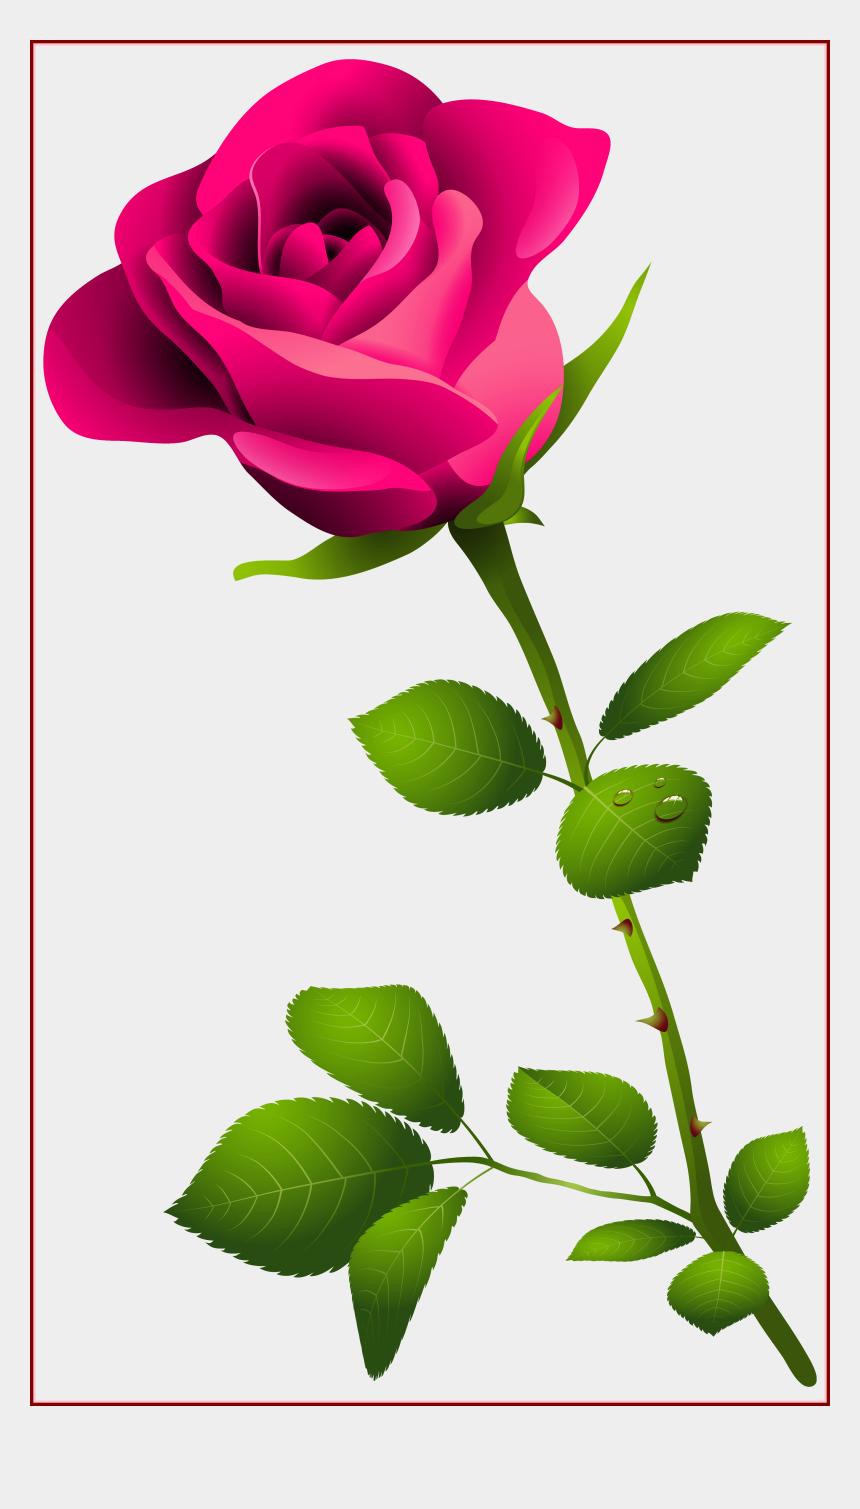 pink roses clipart, Cartoons - Rose Flower Rose Flower Images P Amazing Pink Rose - Long Stem Pink Rose